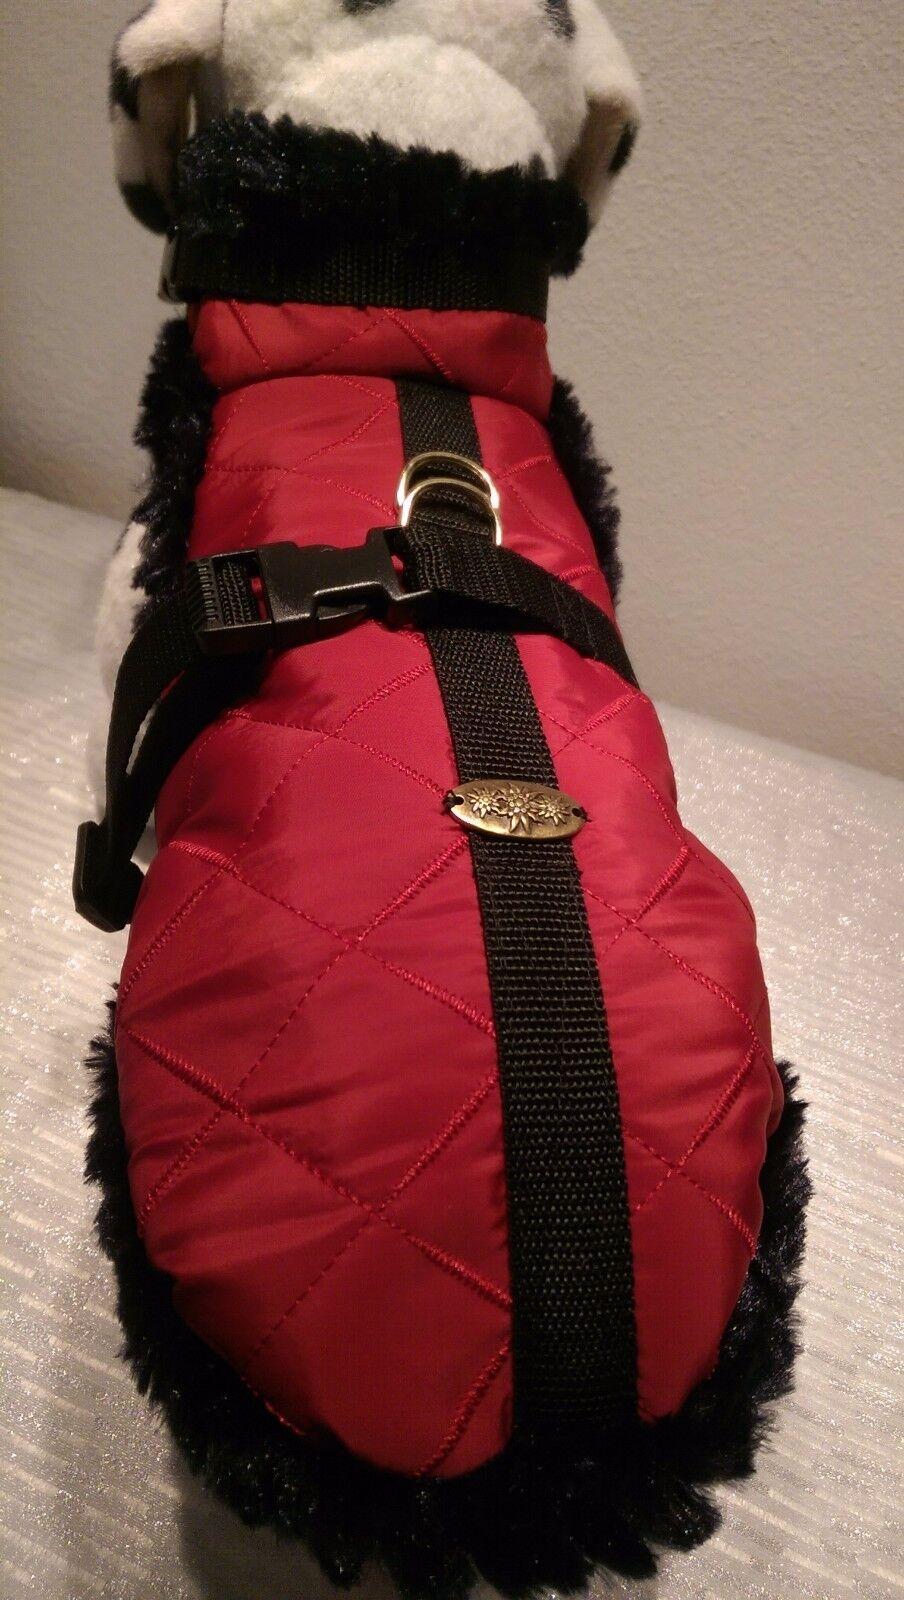 Wintermantel Hundemantel Plüsch M Hunde warm roter Stepp Edelweiss Hunde   | Sehr gute Qualität